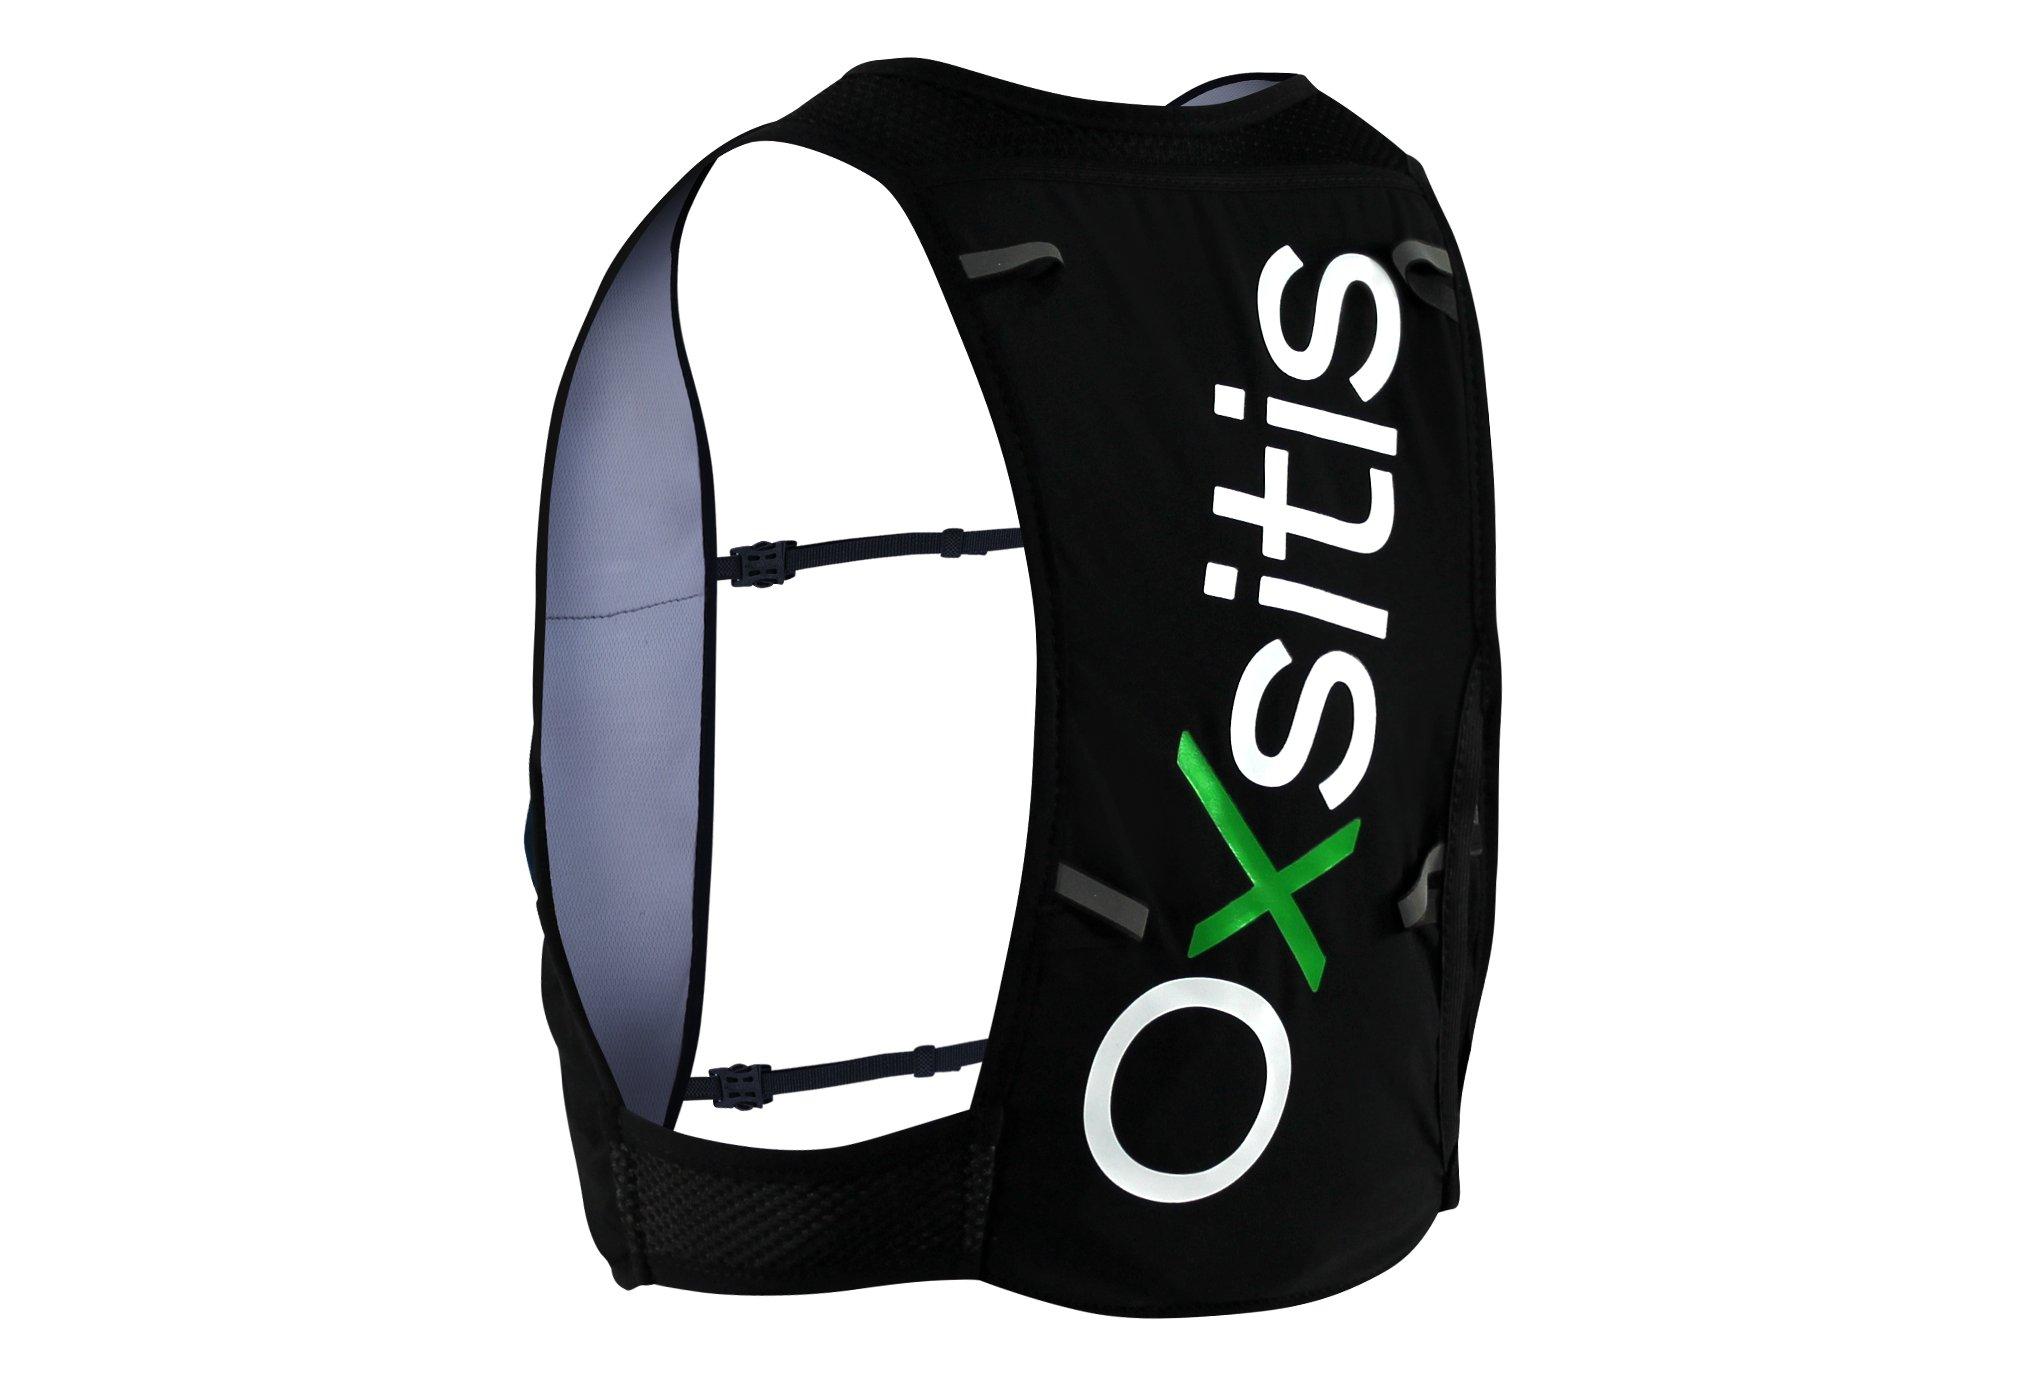 Oxsitis Atom 4 M Sac hydratation / Gourde